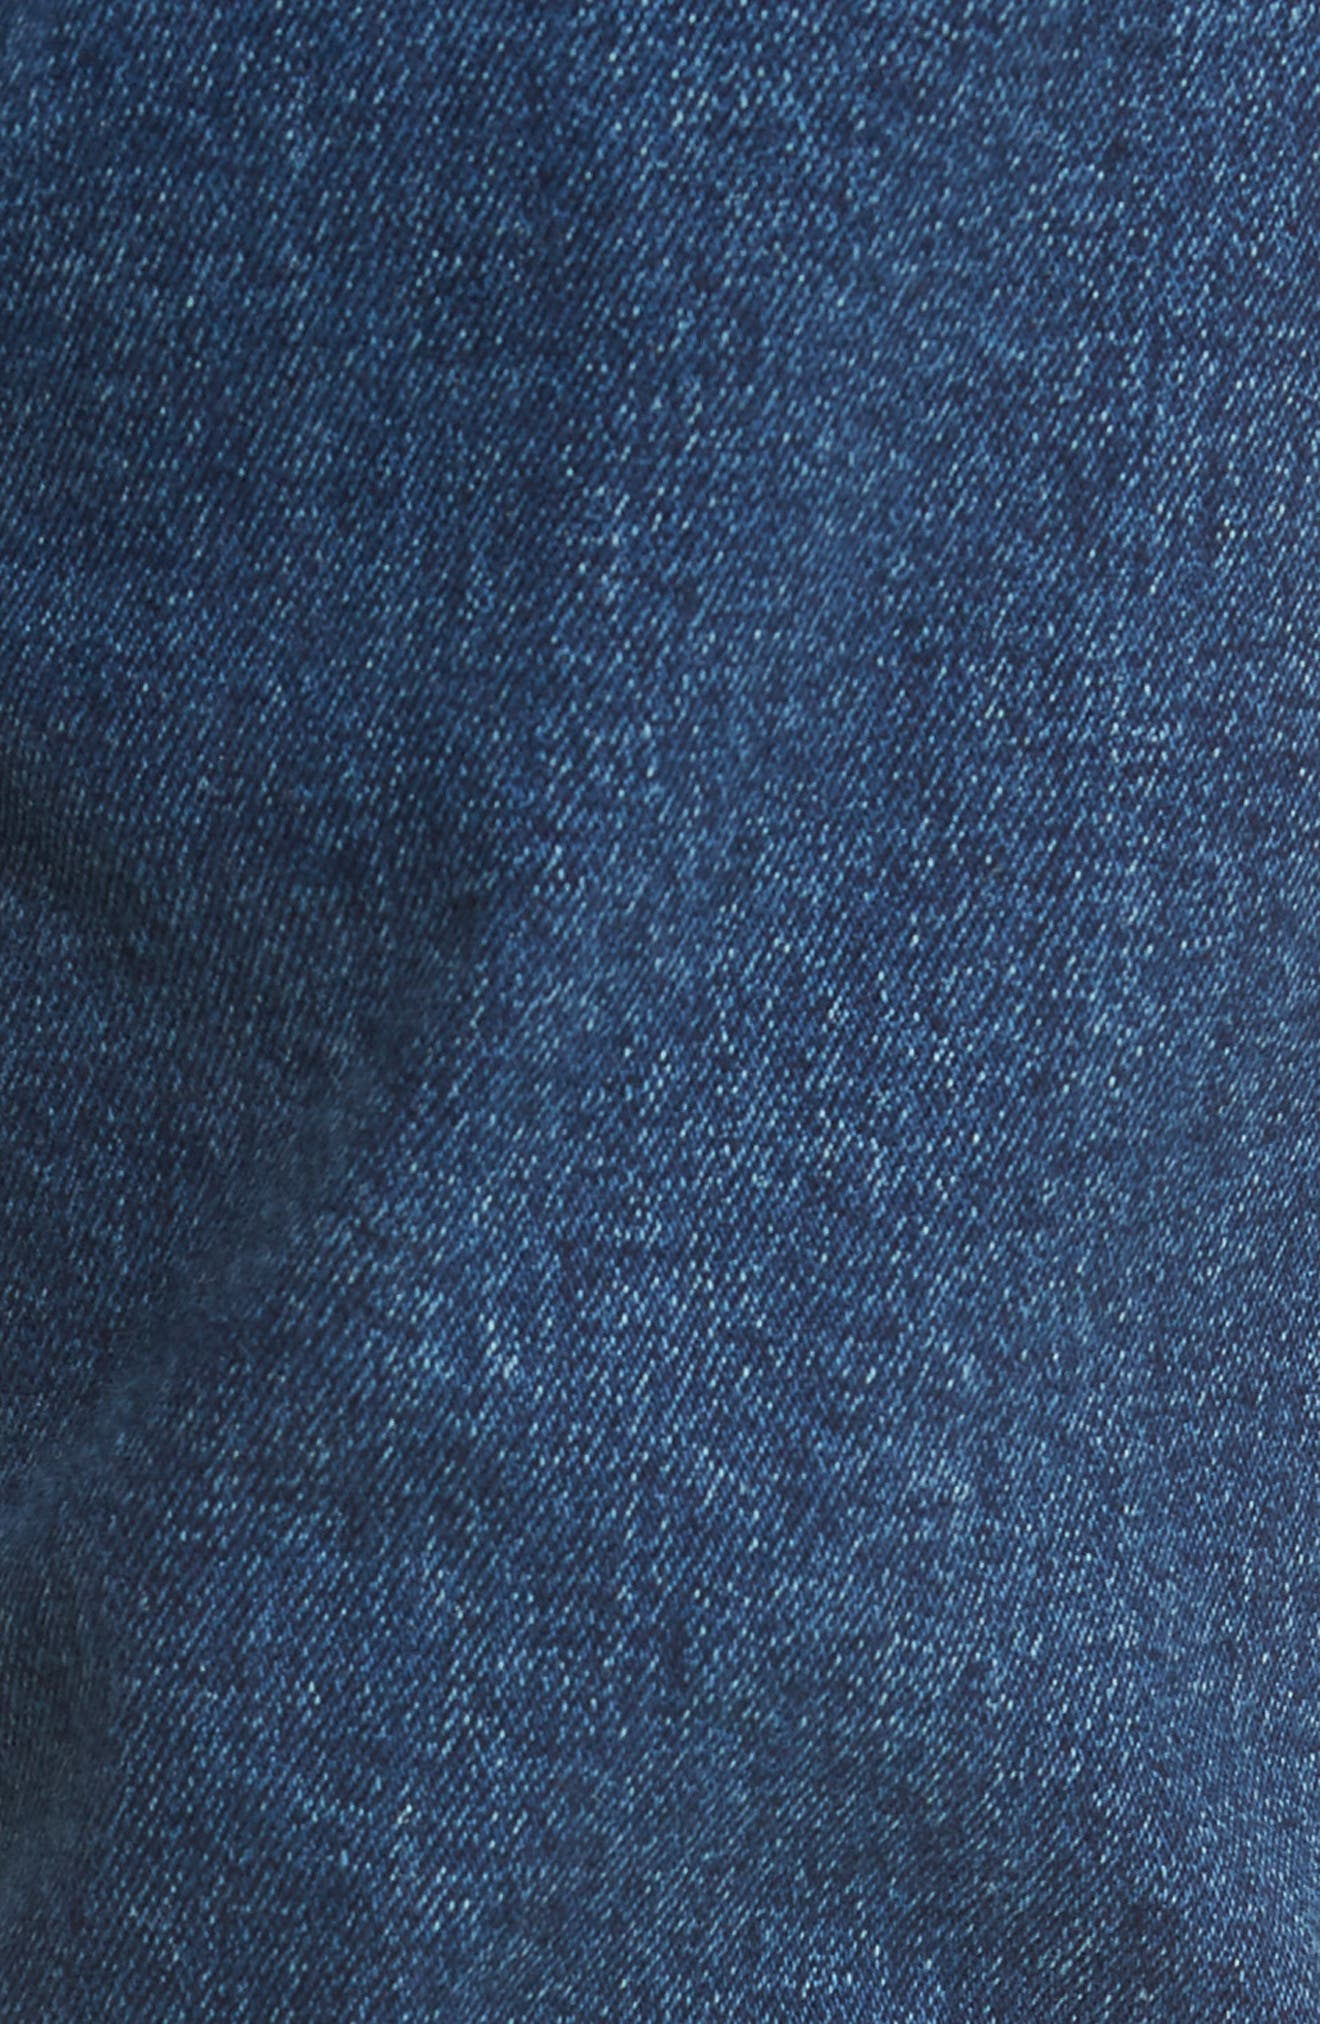 Clark Slim Straight Leg Jeans,                             Alternate thumbnail 5, color,                             WORN ASH BLUE DAMAGED